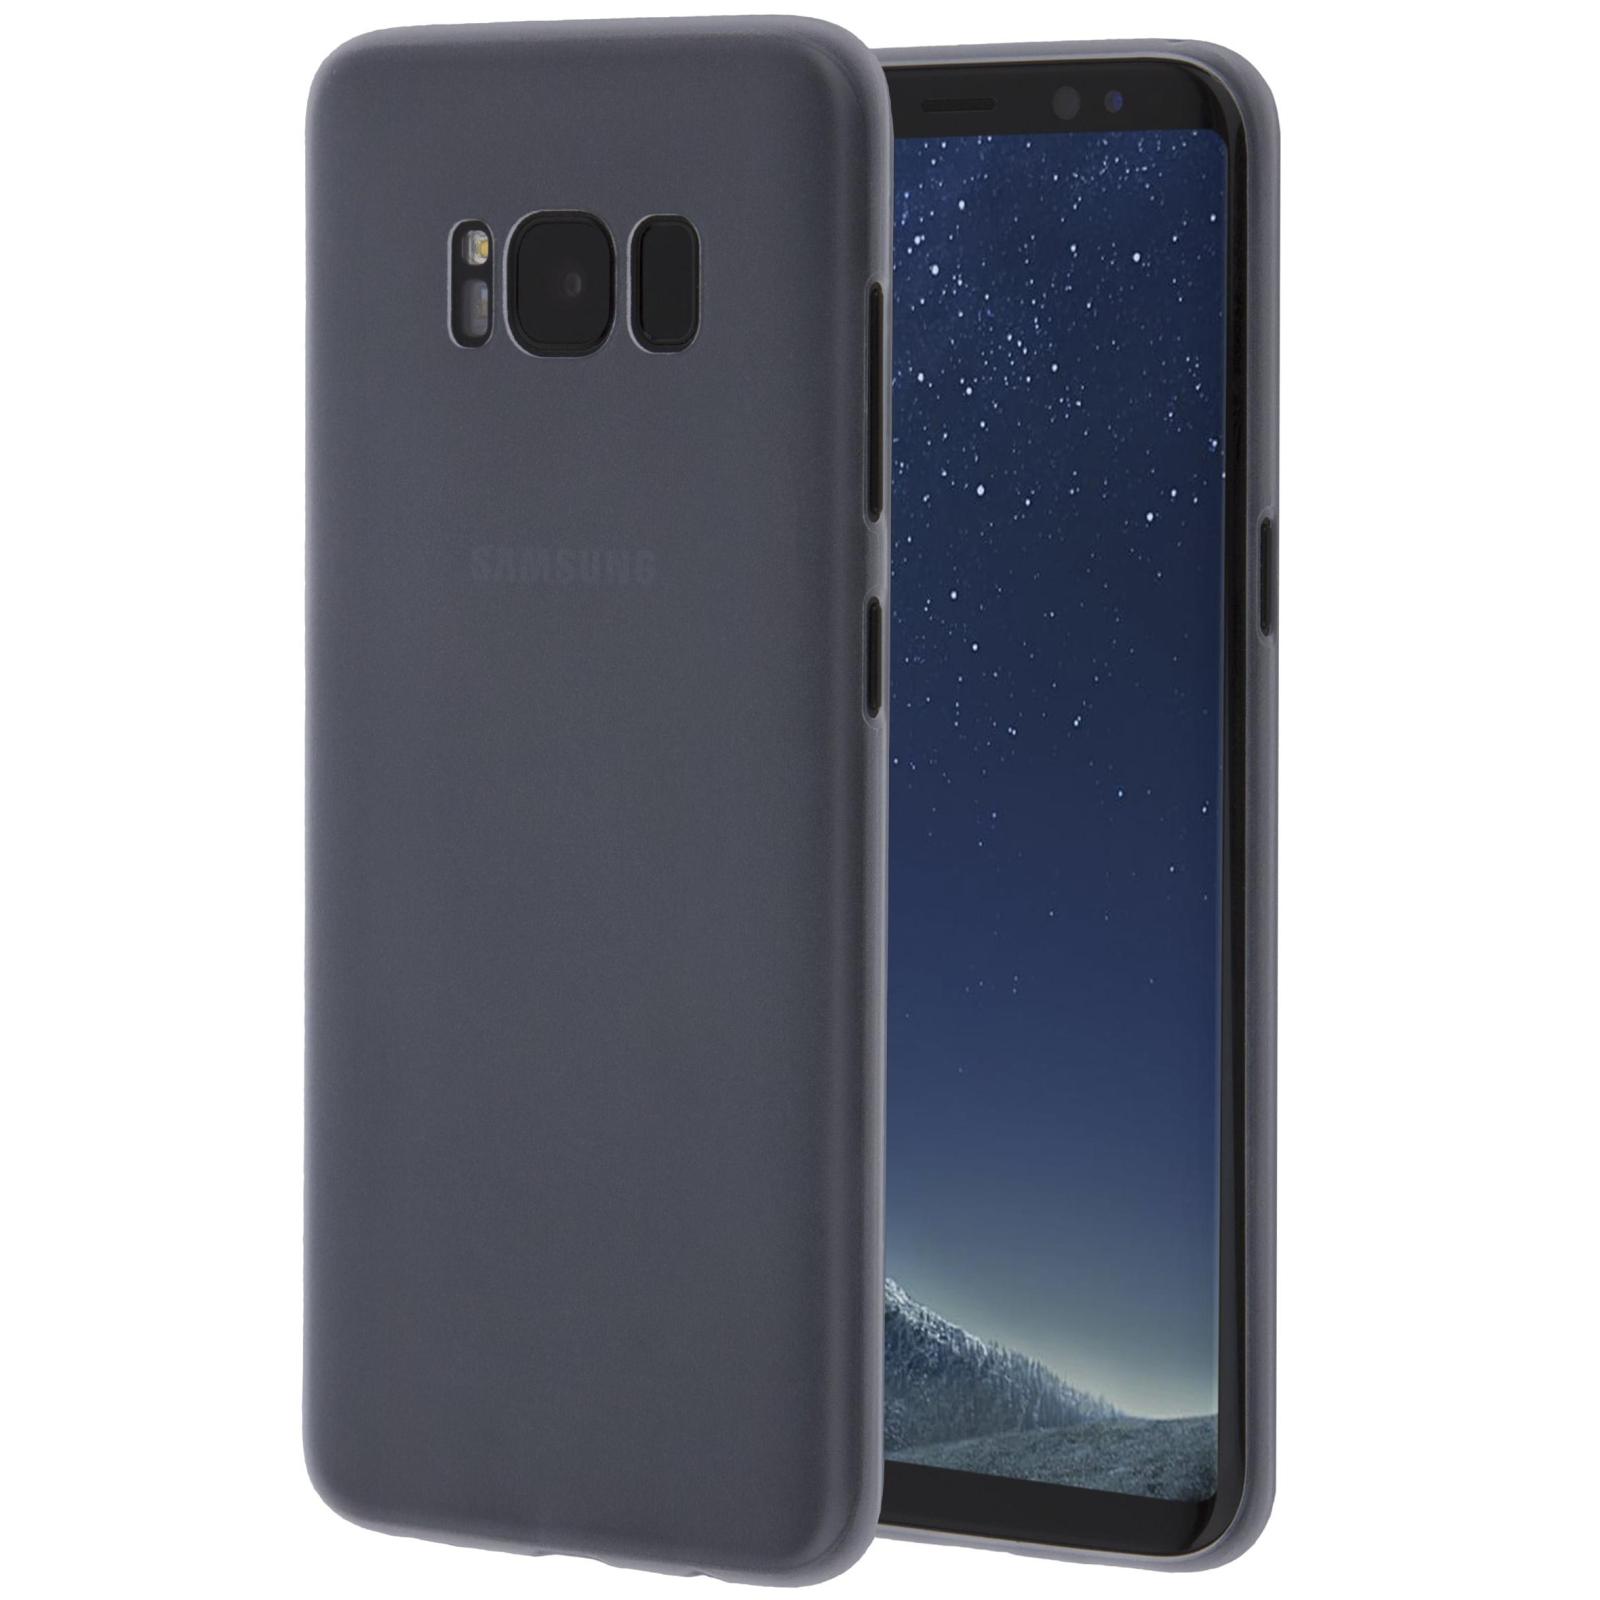 Чехол для моб. телефона MakeFuture Ice Case (PP) для Samsung S8 White (MCI-SS8WH) изображение 2